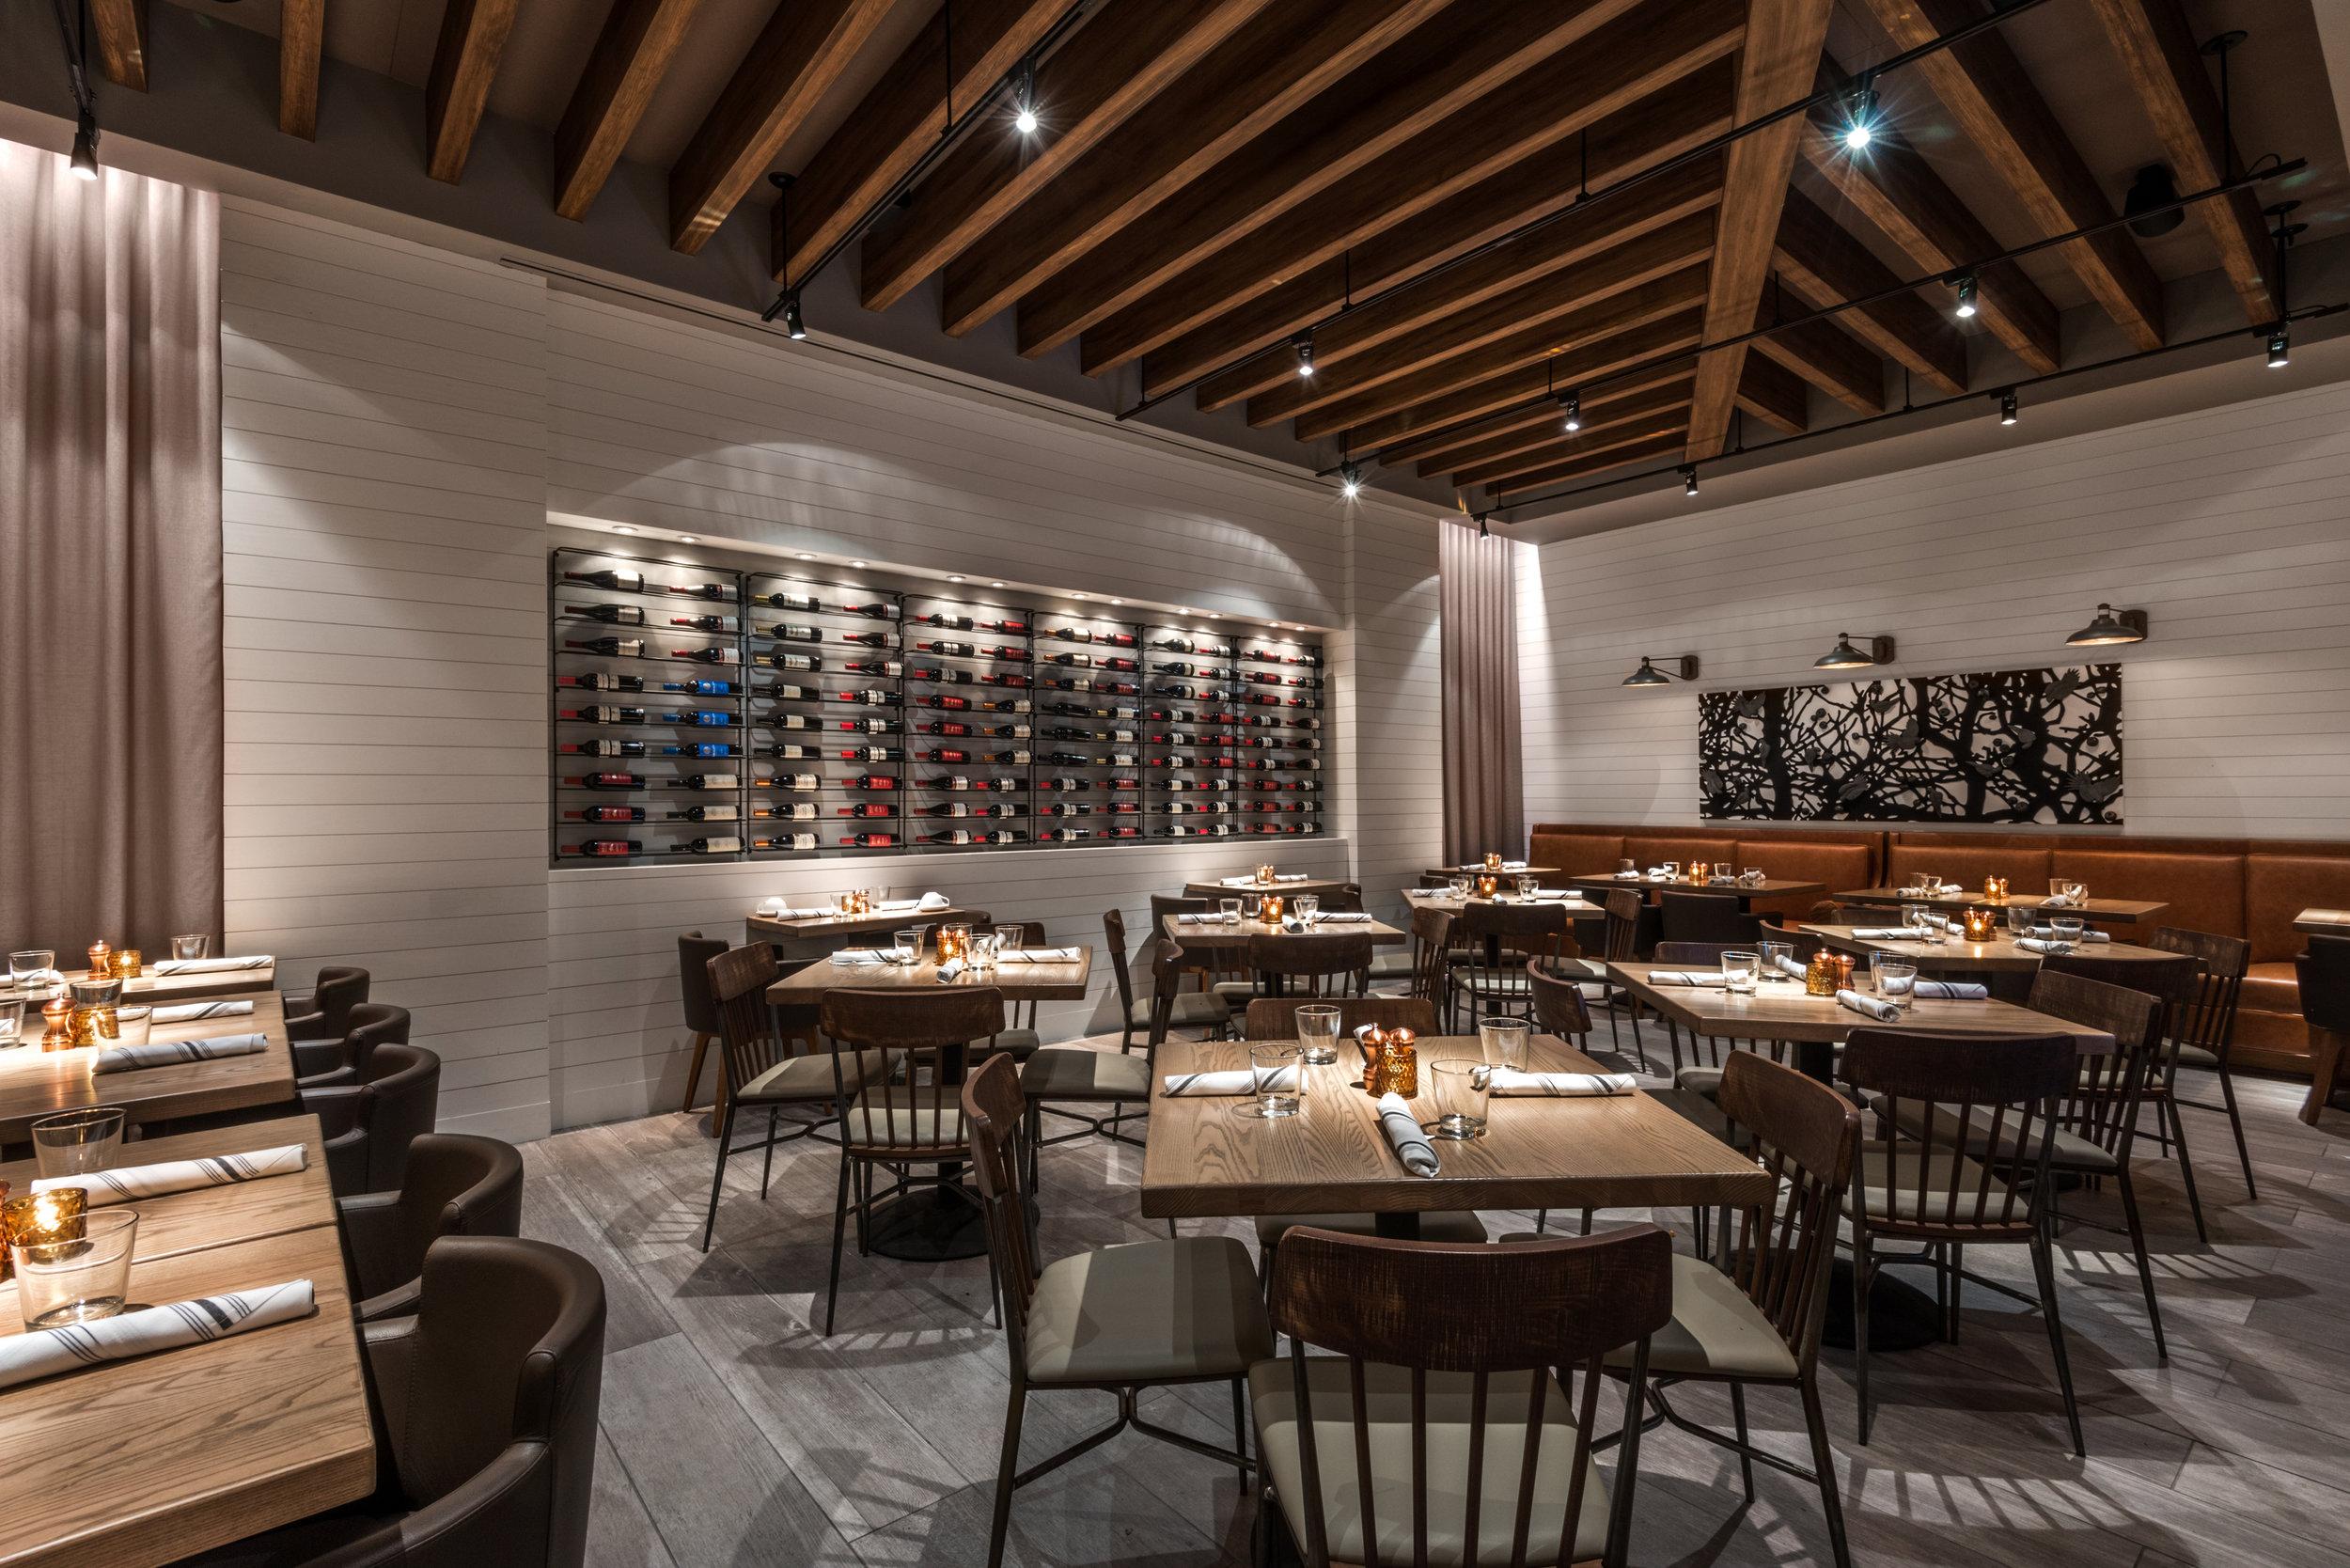 Corinne - Semi Private Dining Area (40 ppl).jpg